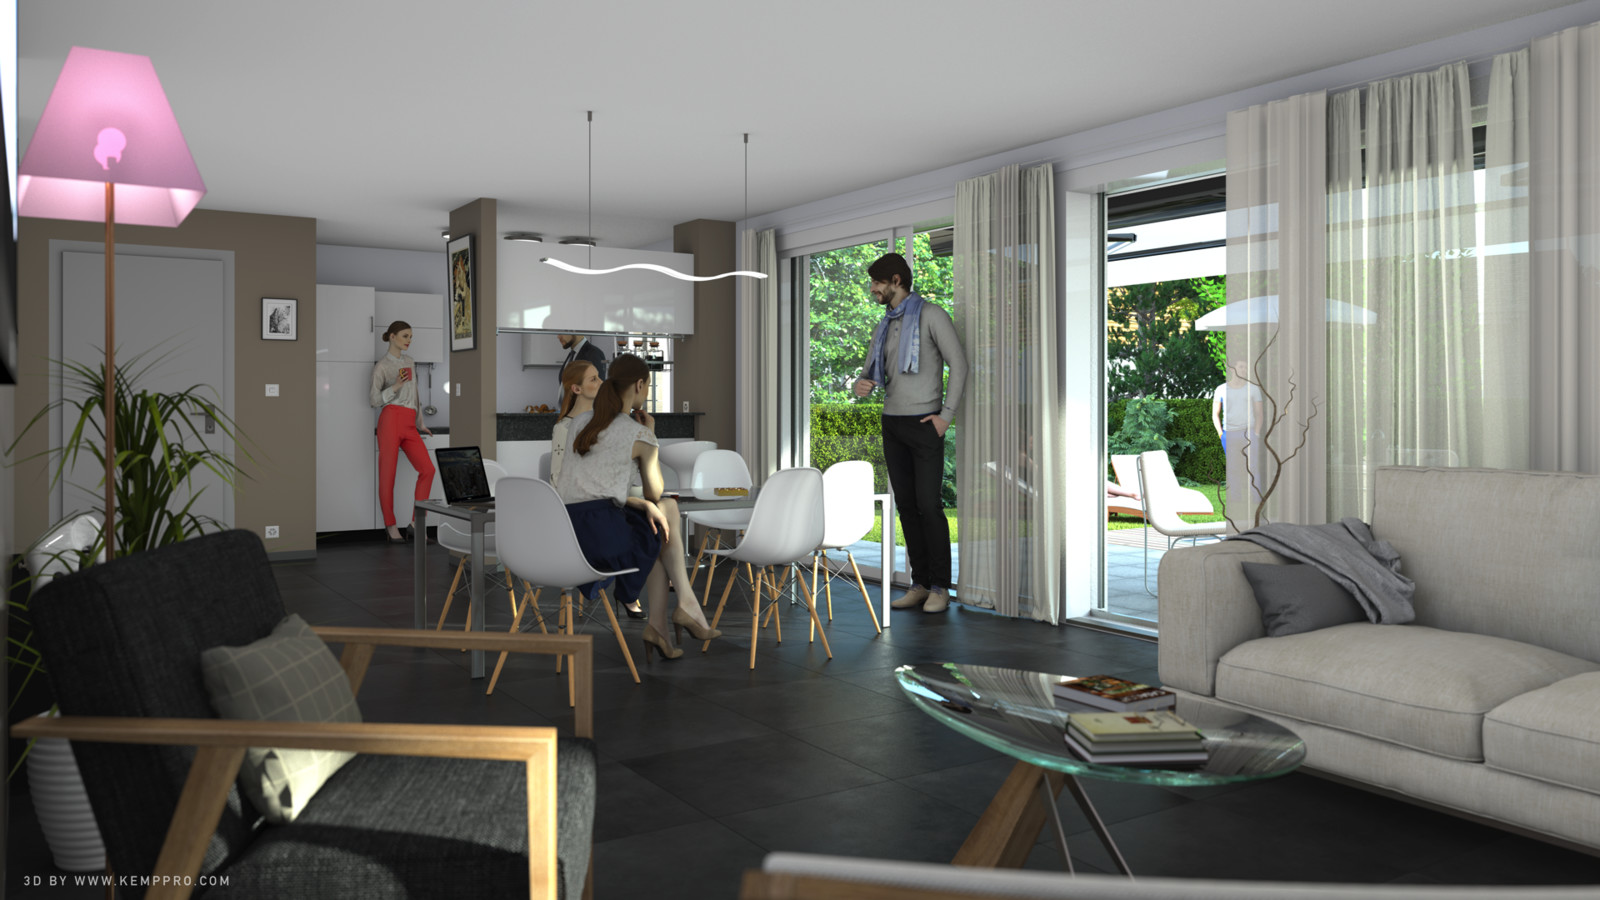 SketchUp + Thea Render.  House model test 2-Scene 12.img Full 3_KP. Presto AO HD 5333 × 3000.